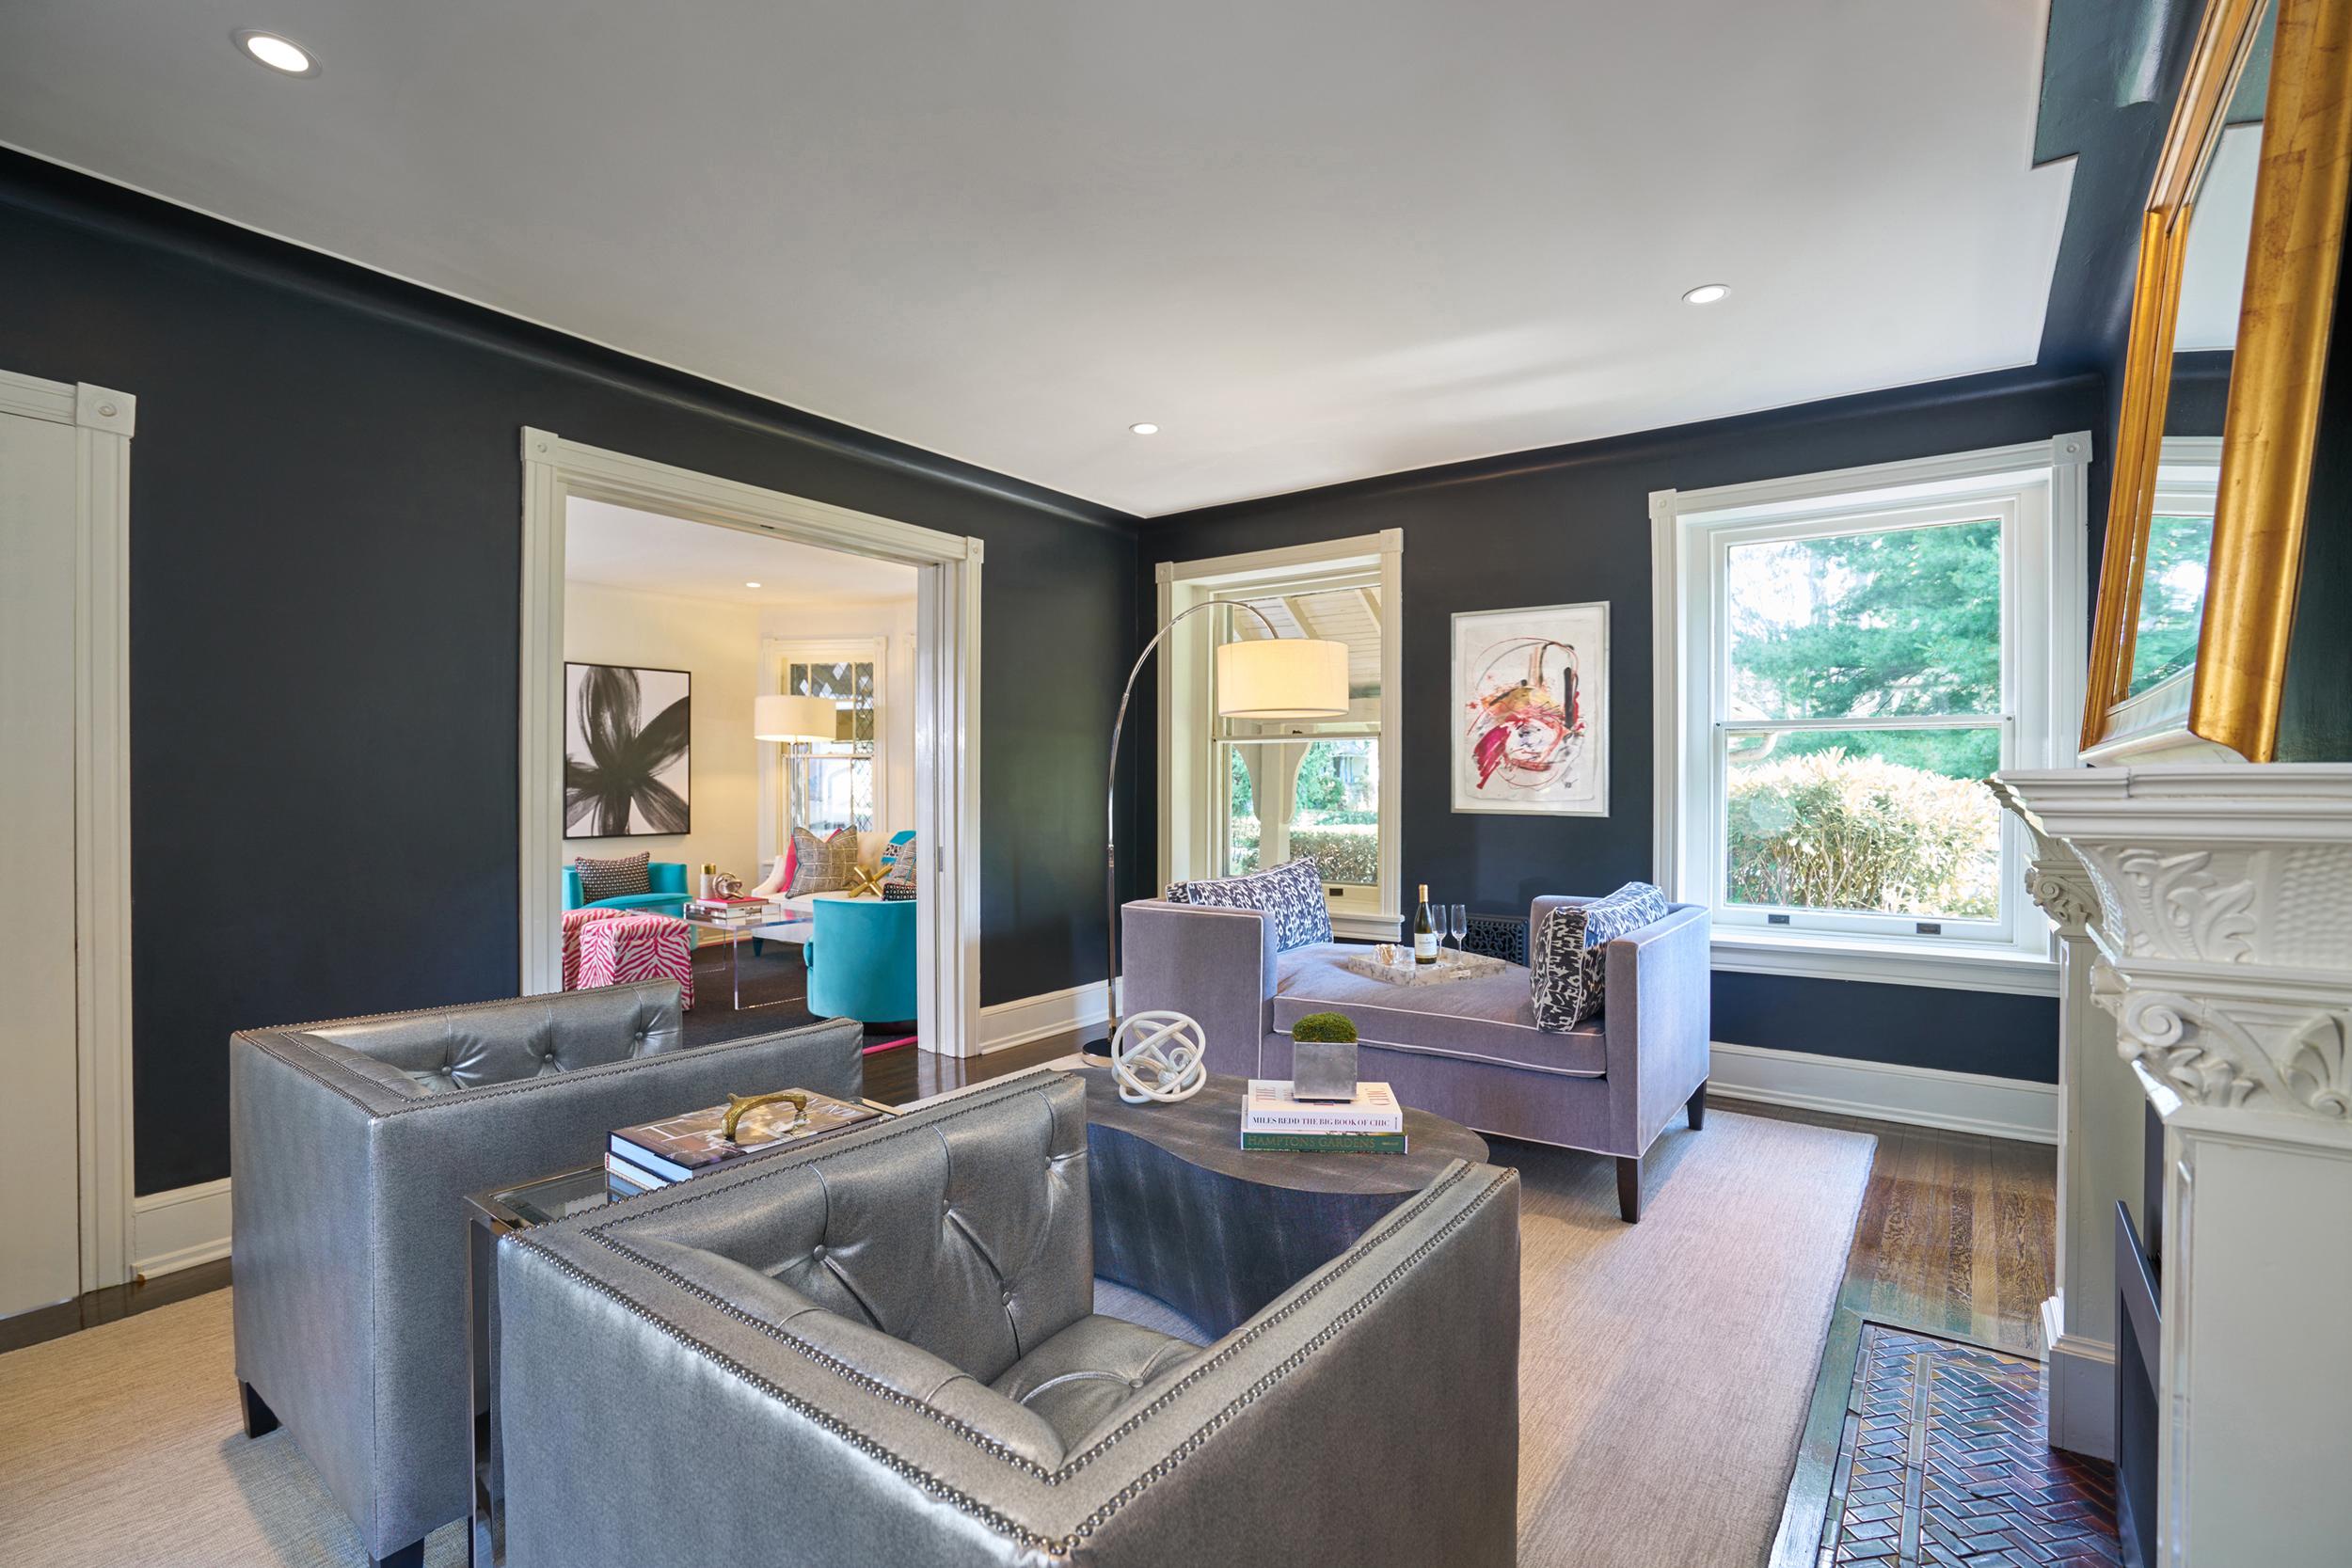 Black walls offset retro inspired furnishings.